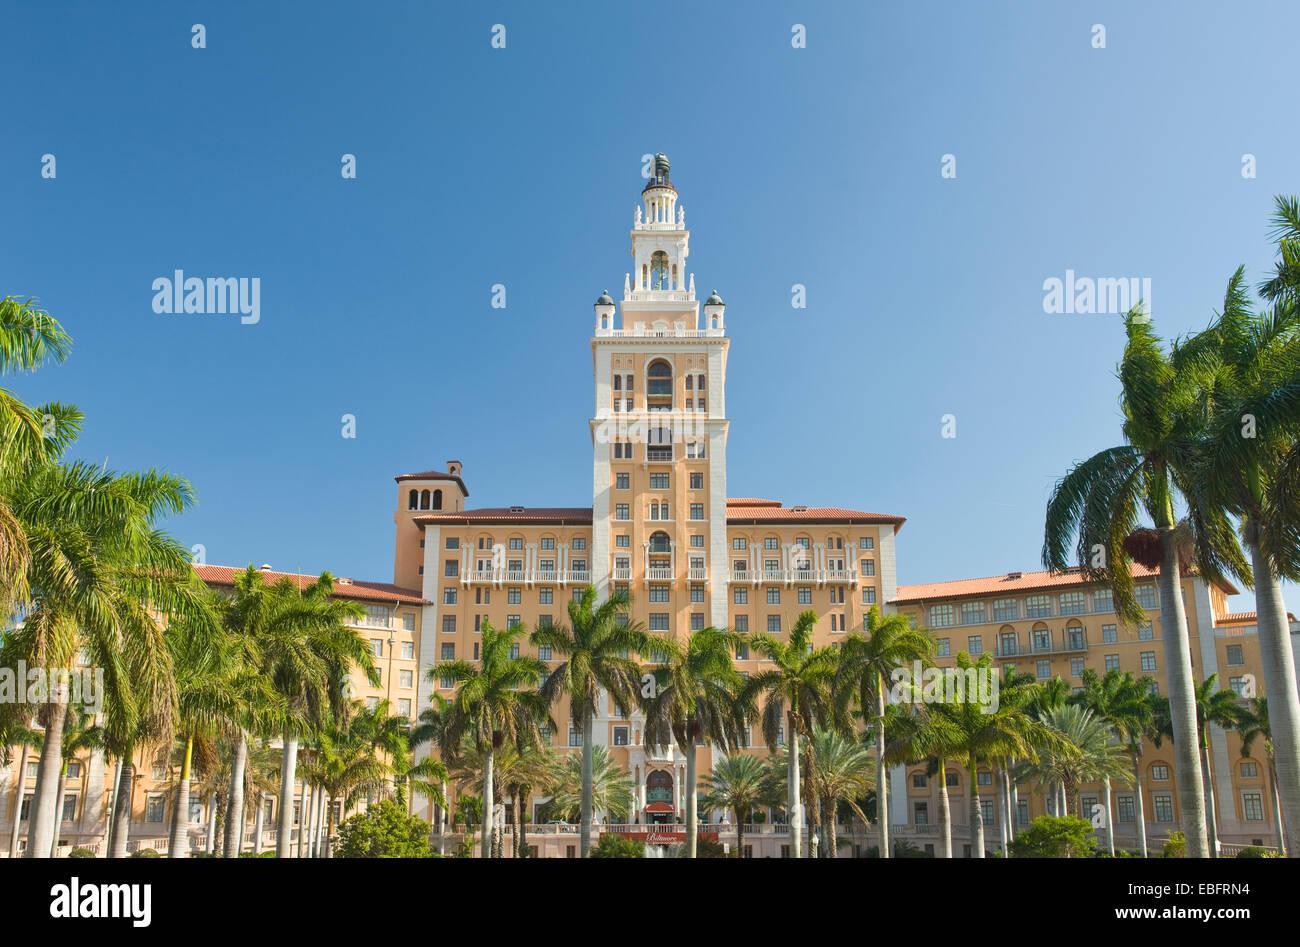 HISTORIC BILTMORE HOTEL CORAL GABLES MIAMI FLORIDA USA - Stock Image